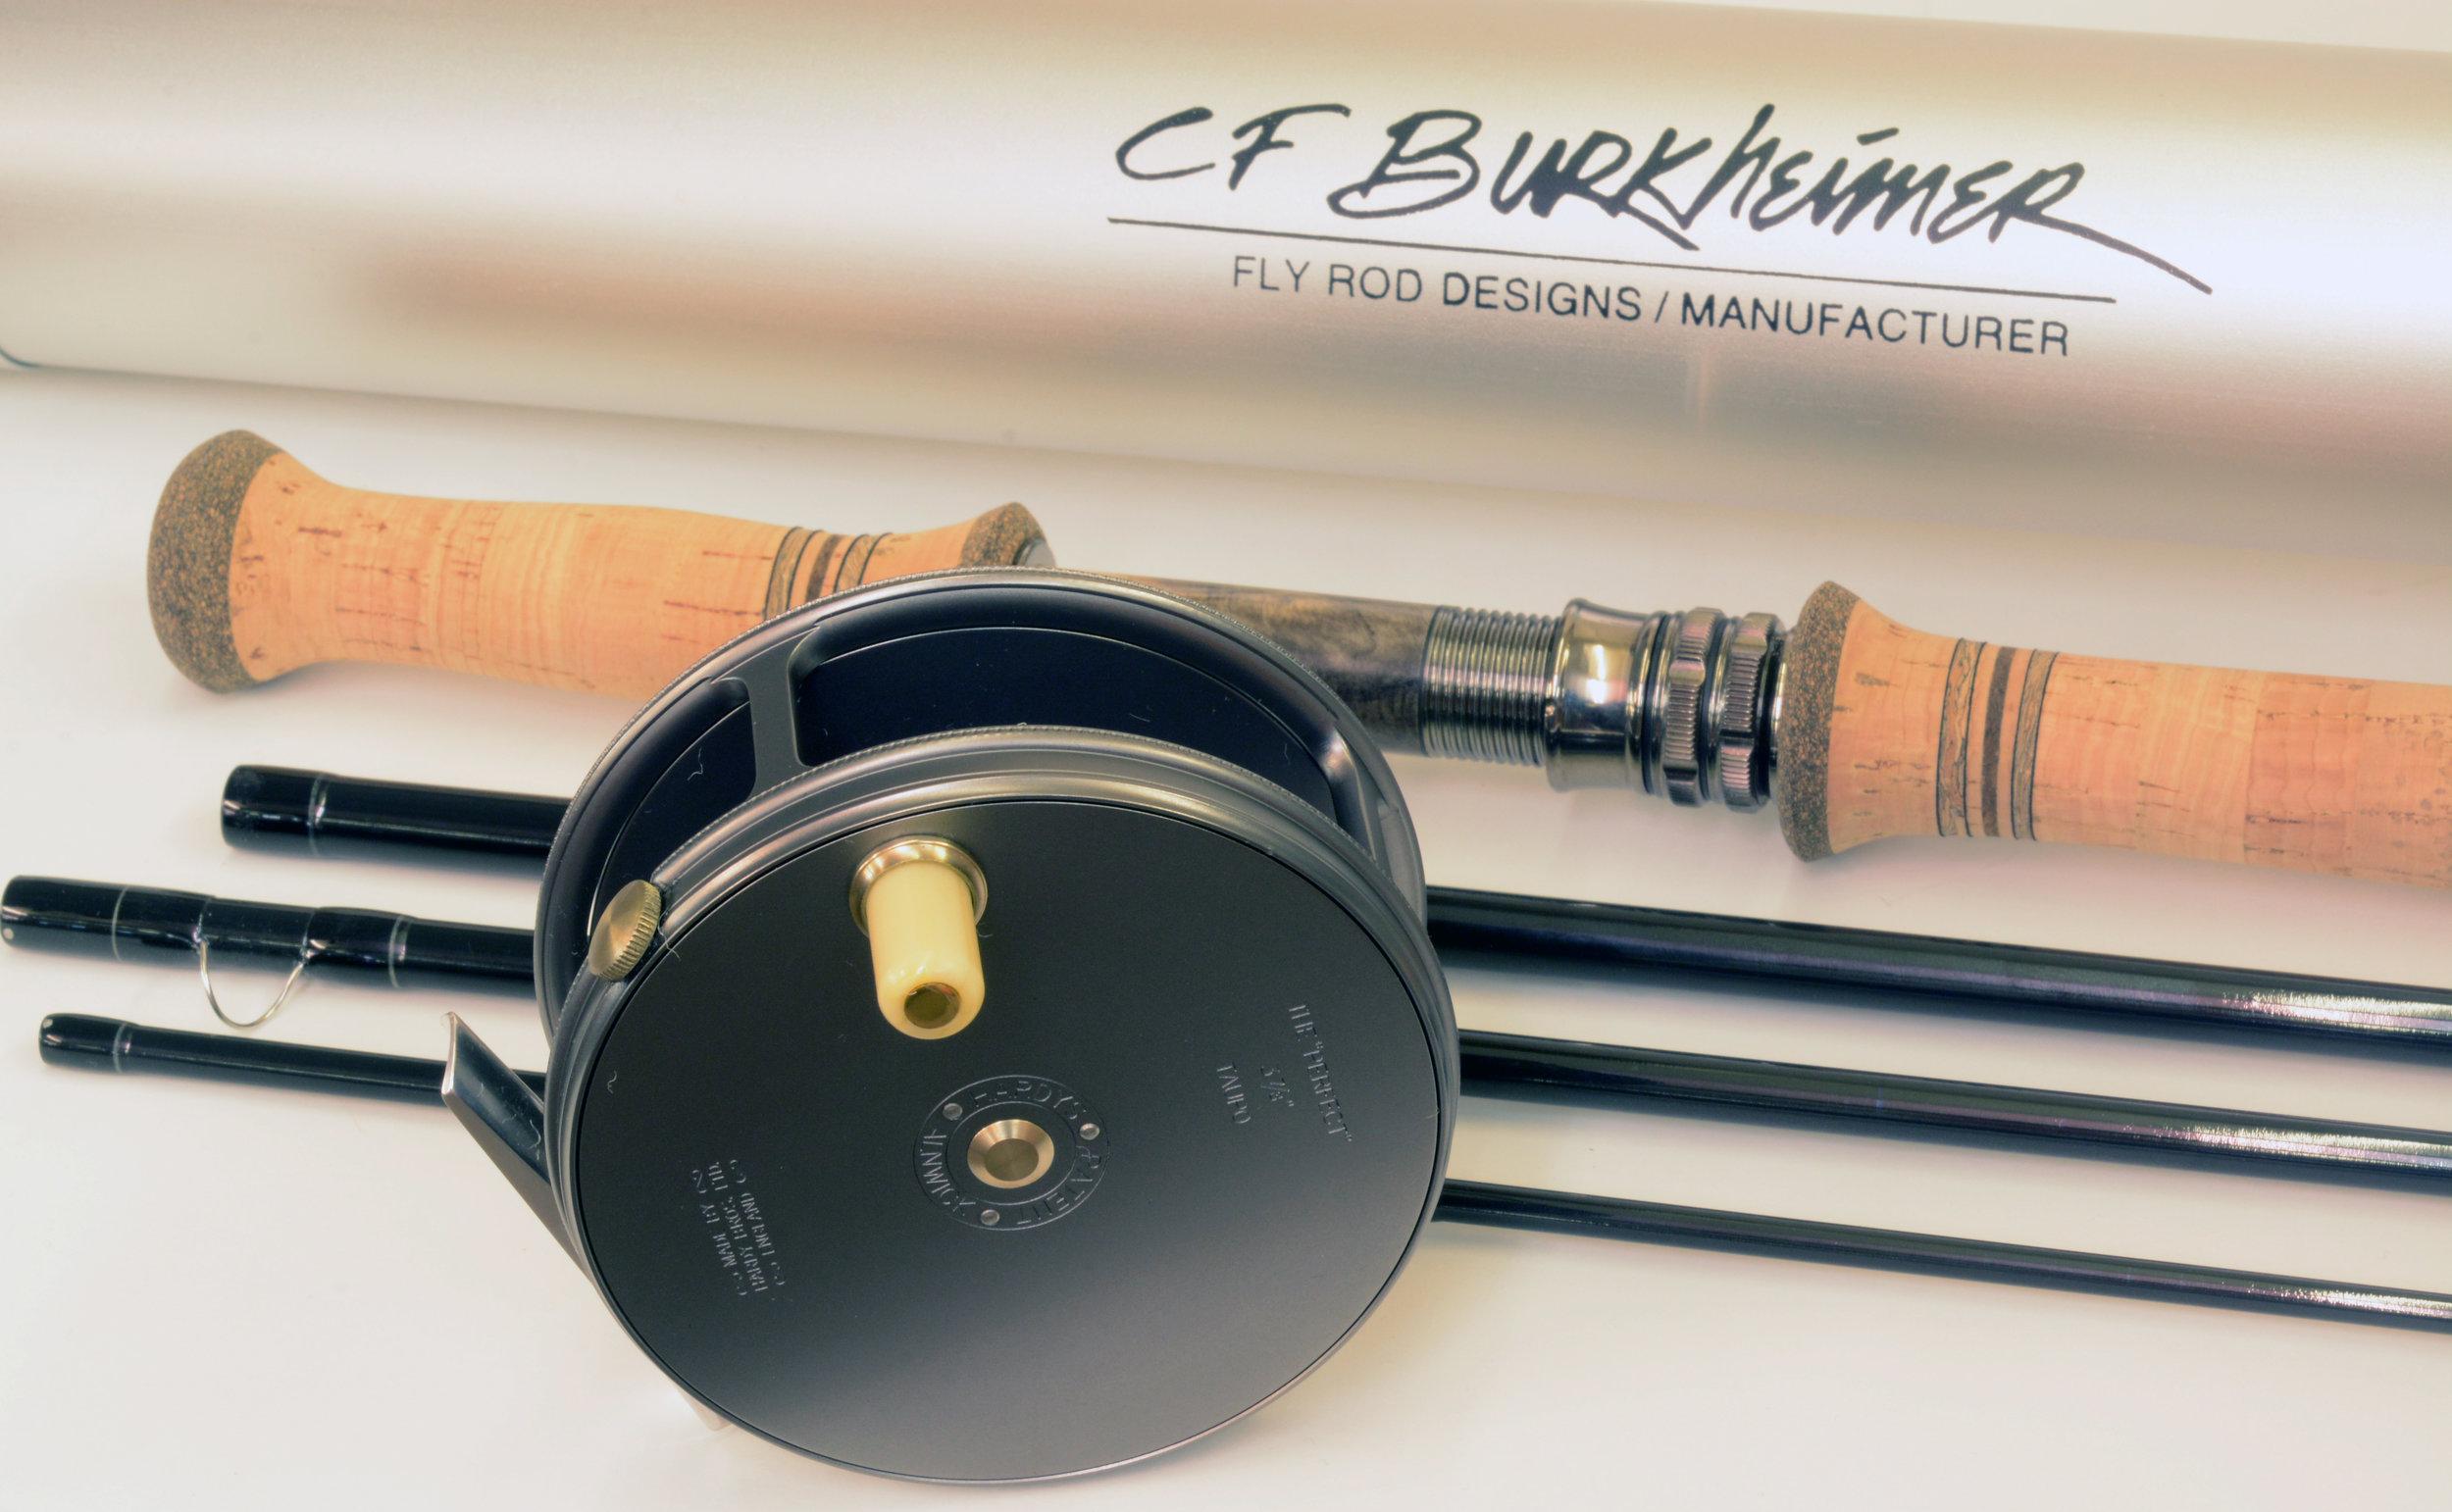 6139-4 CF Burkheimer Presentation with Hardy Taupo Reel 2